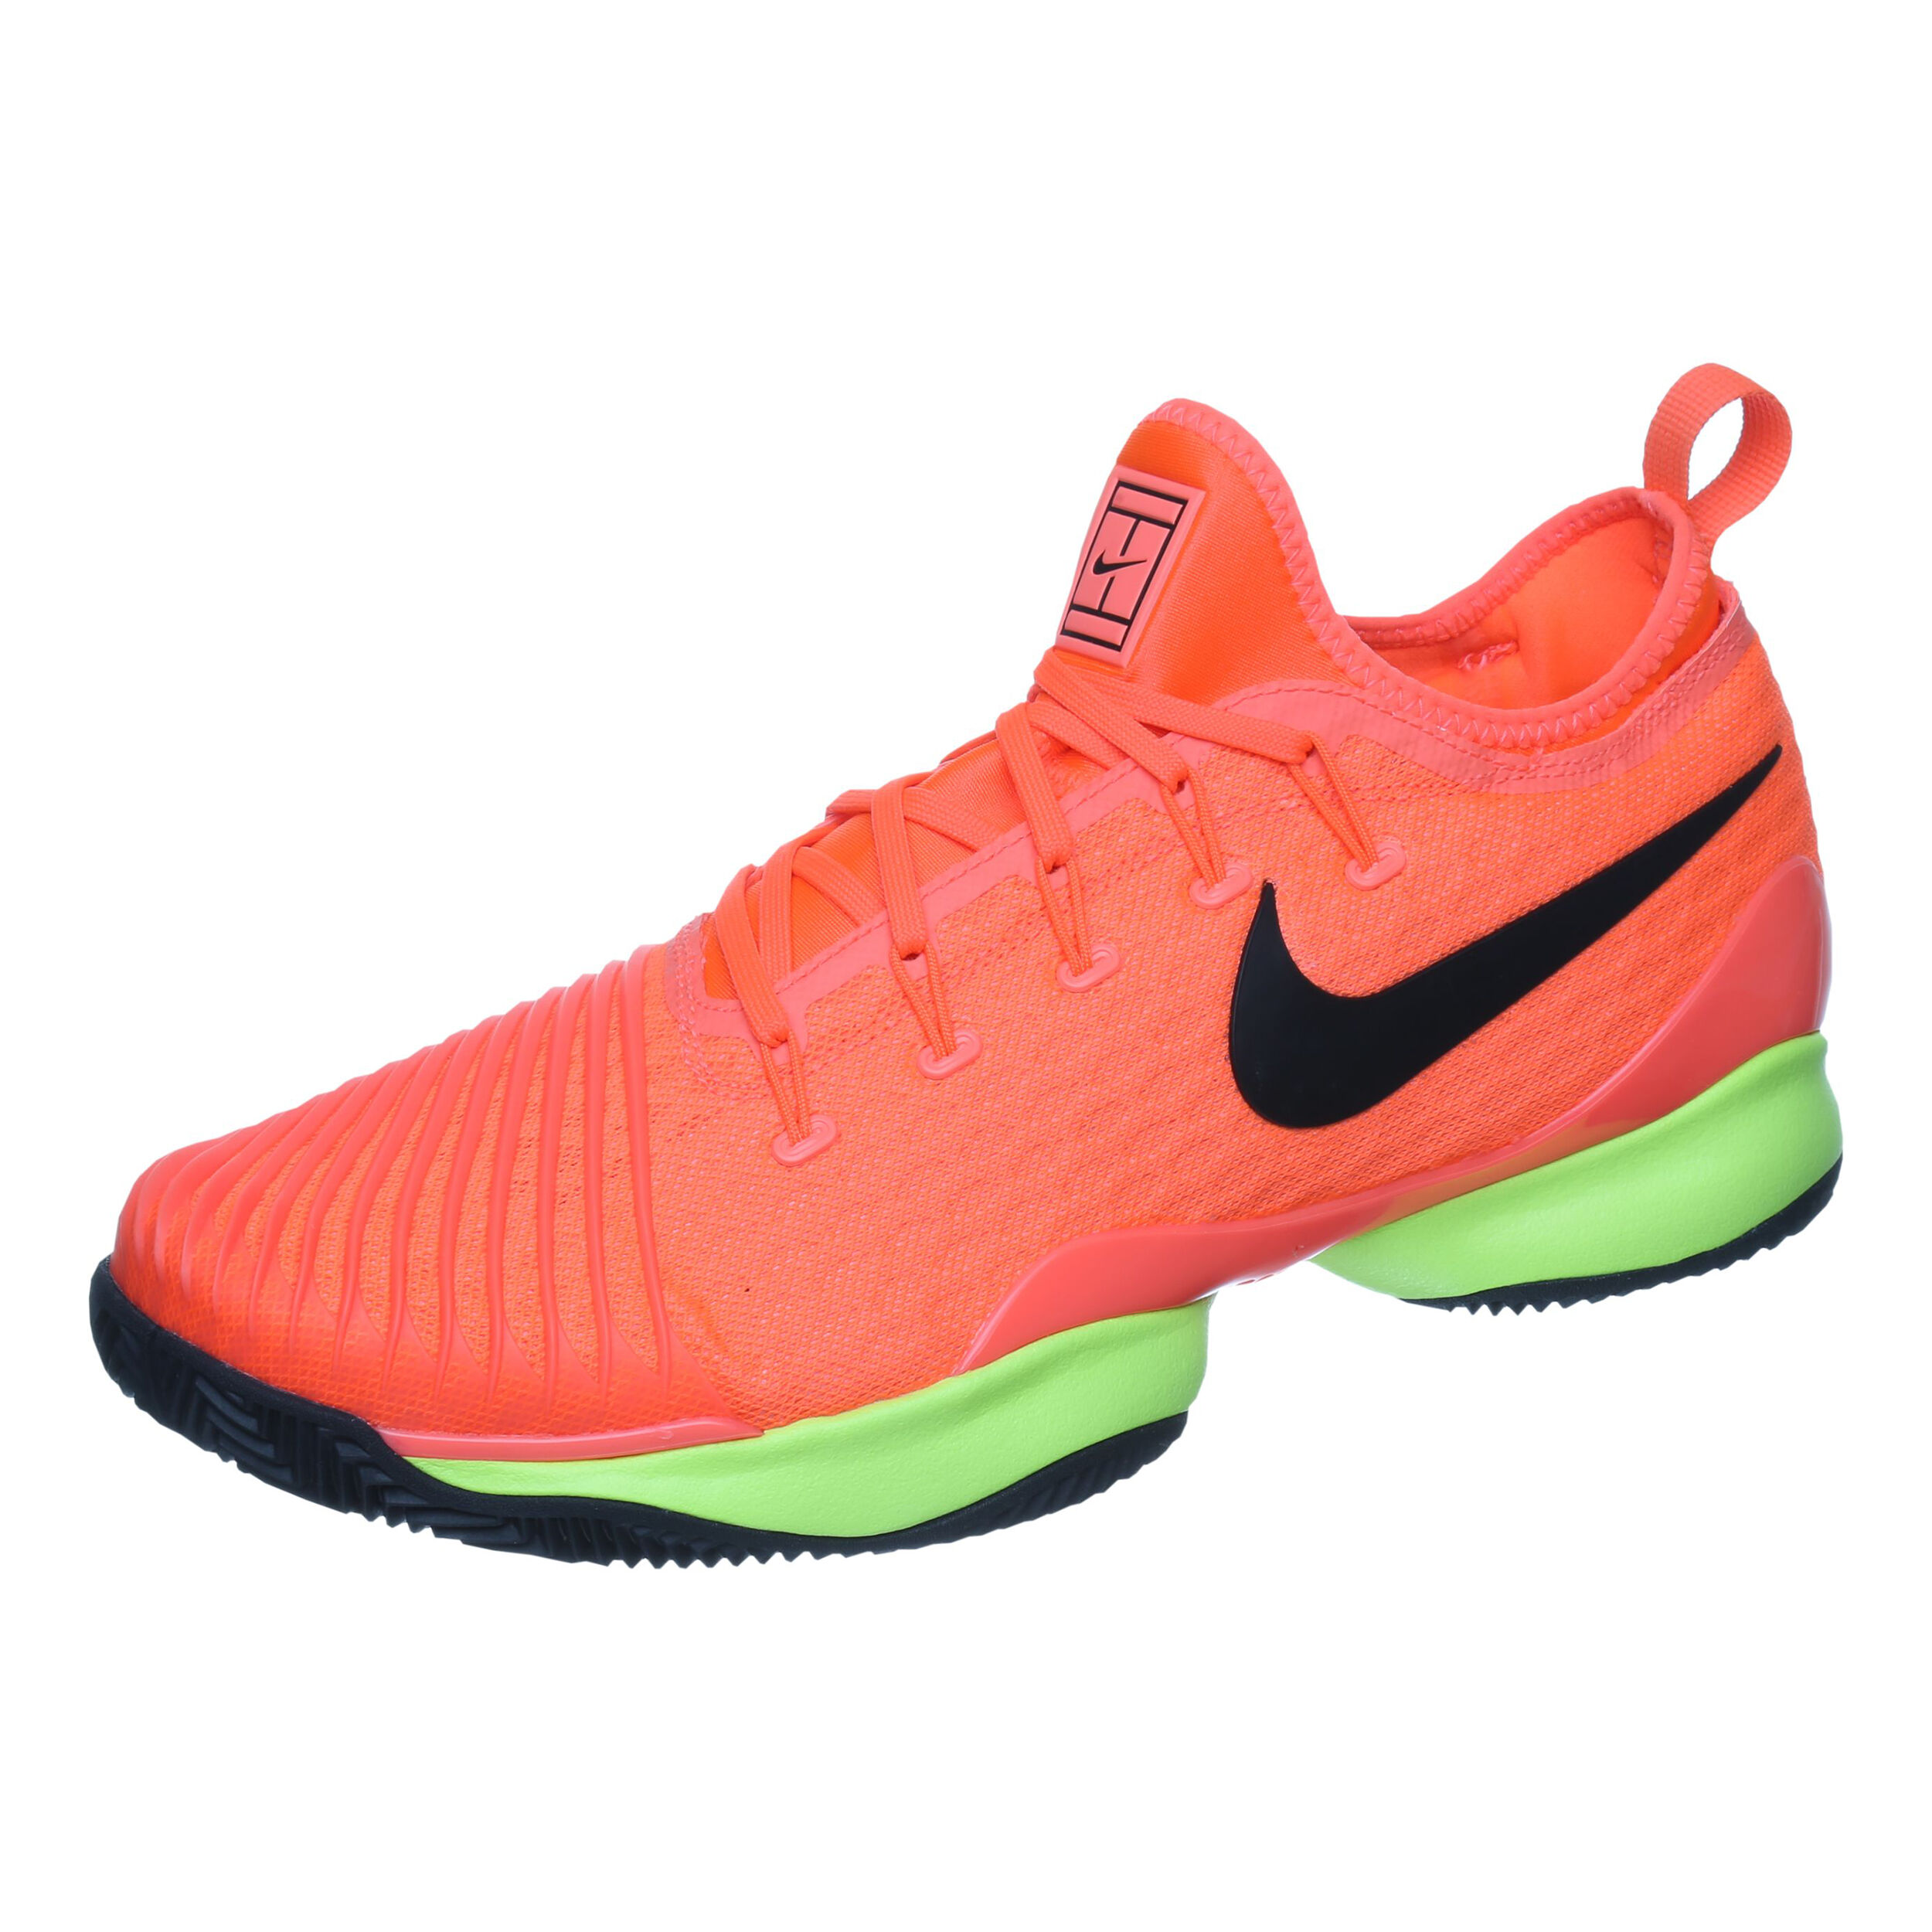 Nike Air Zoom Ultra React Clay Sko F?r Grus Herrar Orange